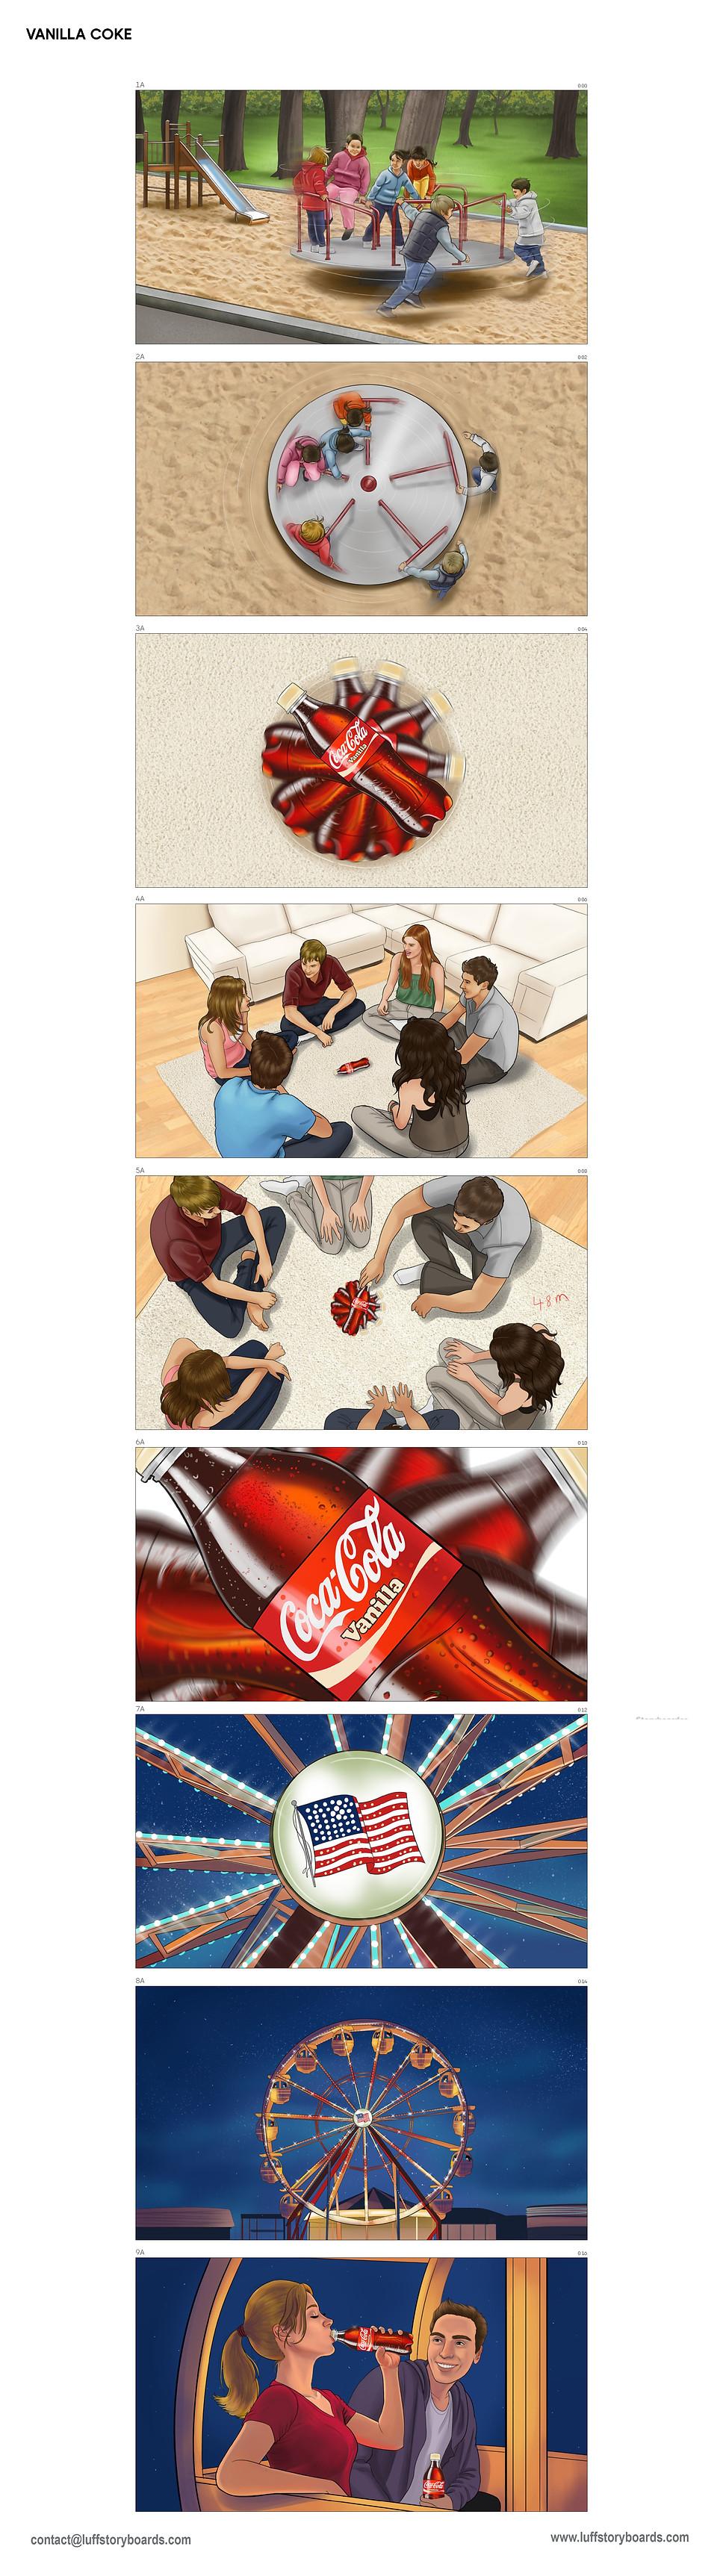 Vanilla Coke_luffstoryboards.jpg